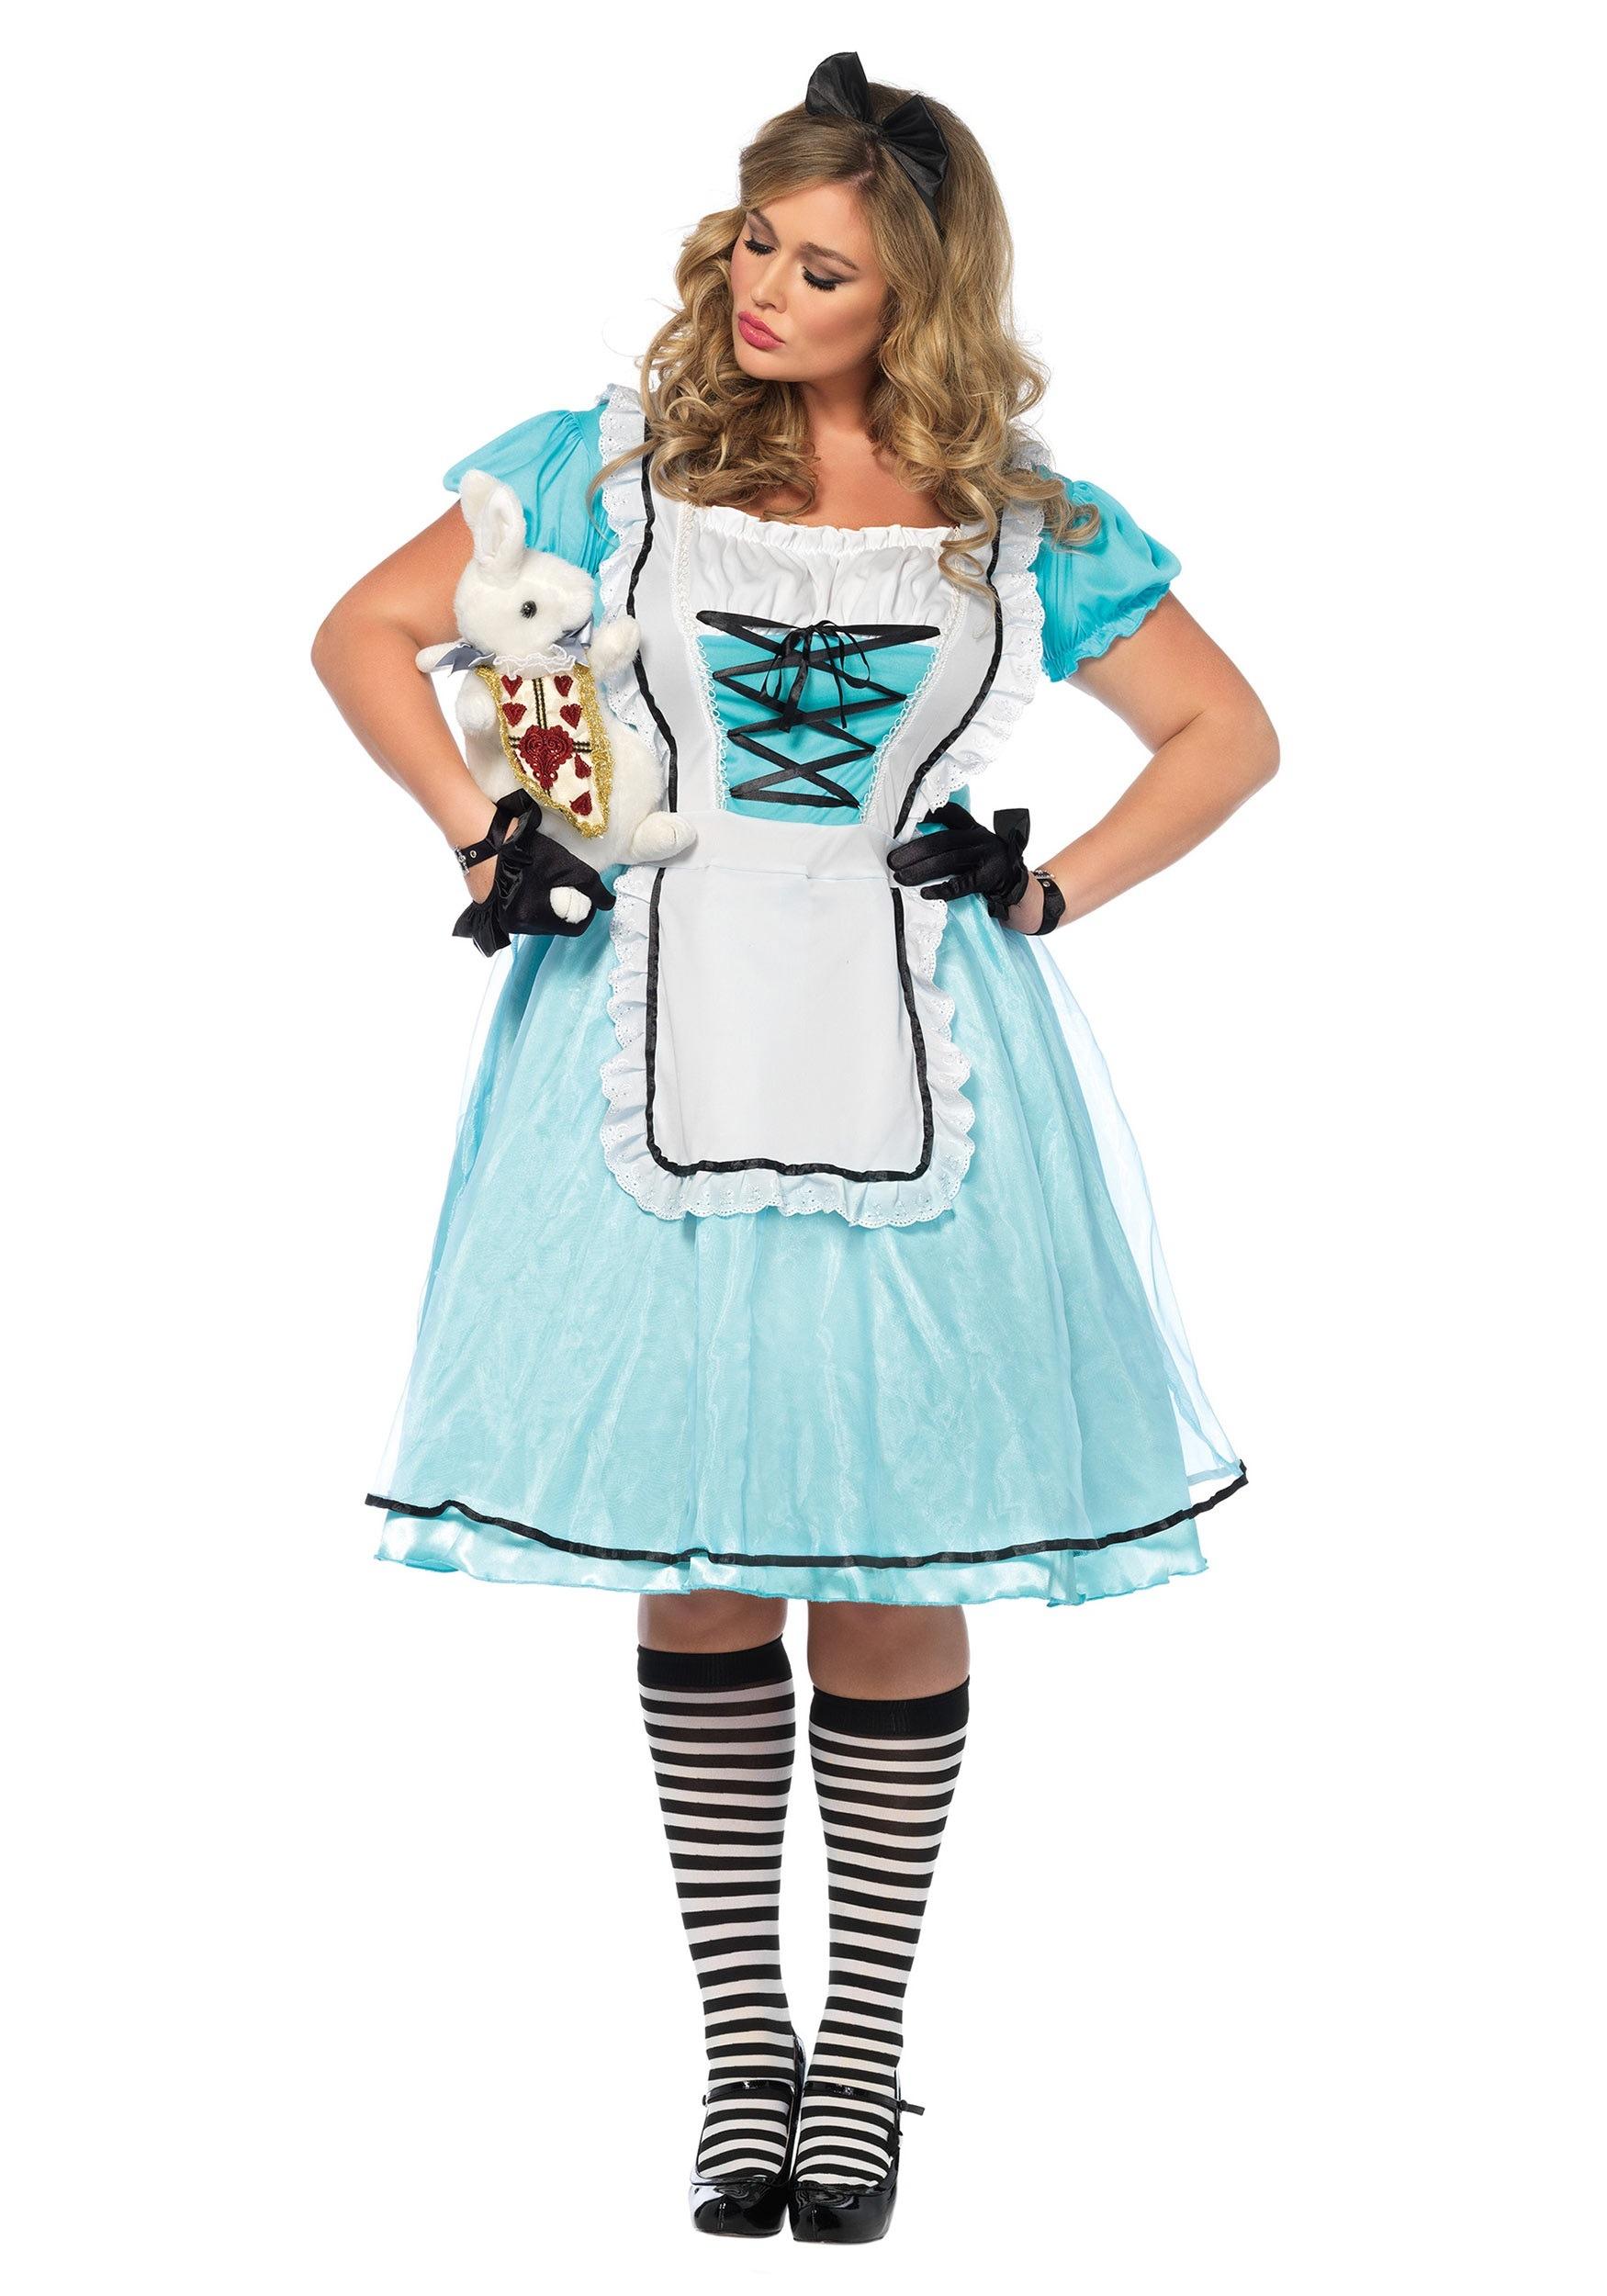 White apron alice wonderland costume - White Apron Alice Wonderland Costume 80